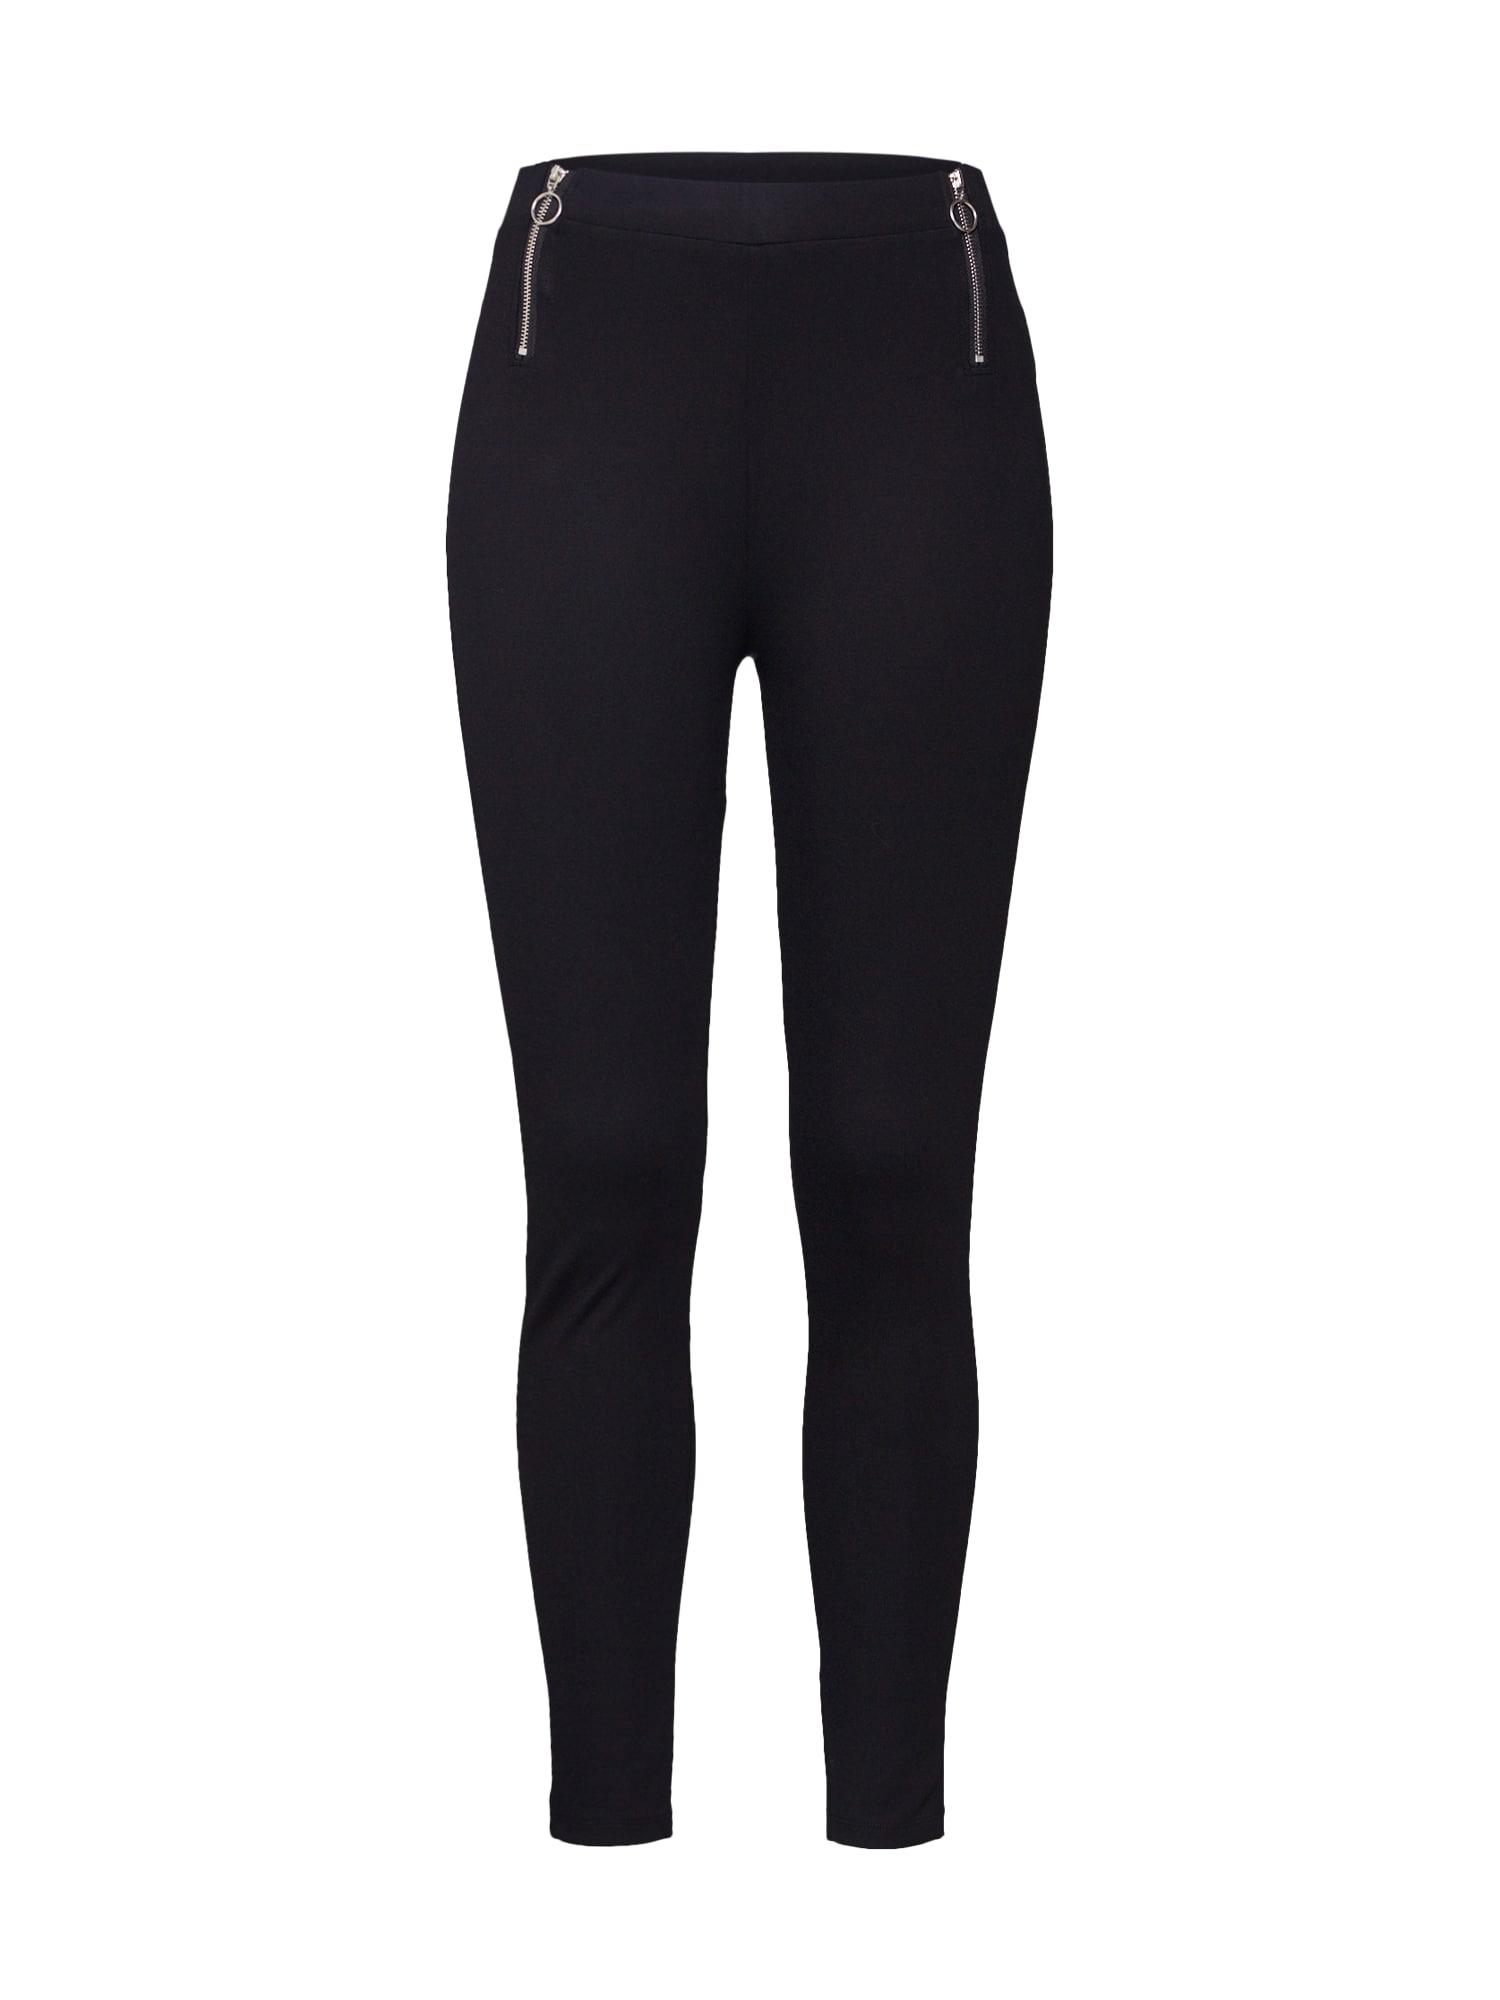 ABOUT YOU Chino stiliaus kelnės 'Florence Leggings' juoda